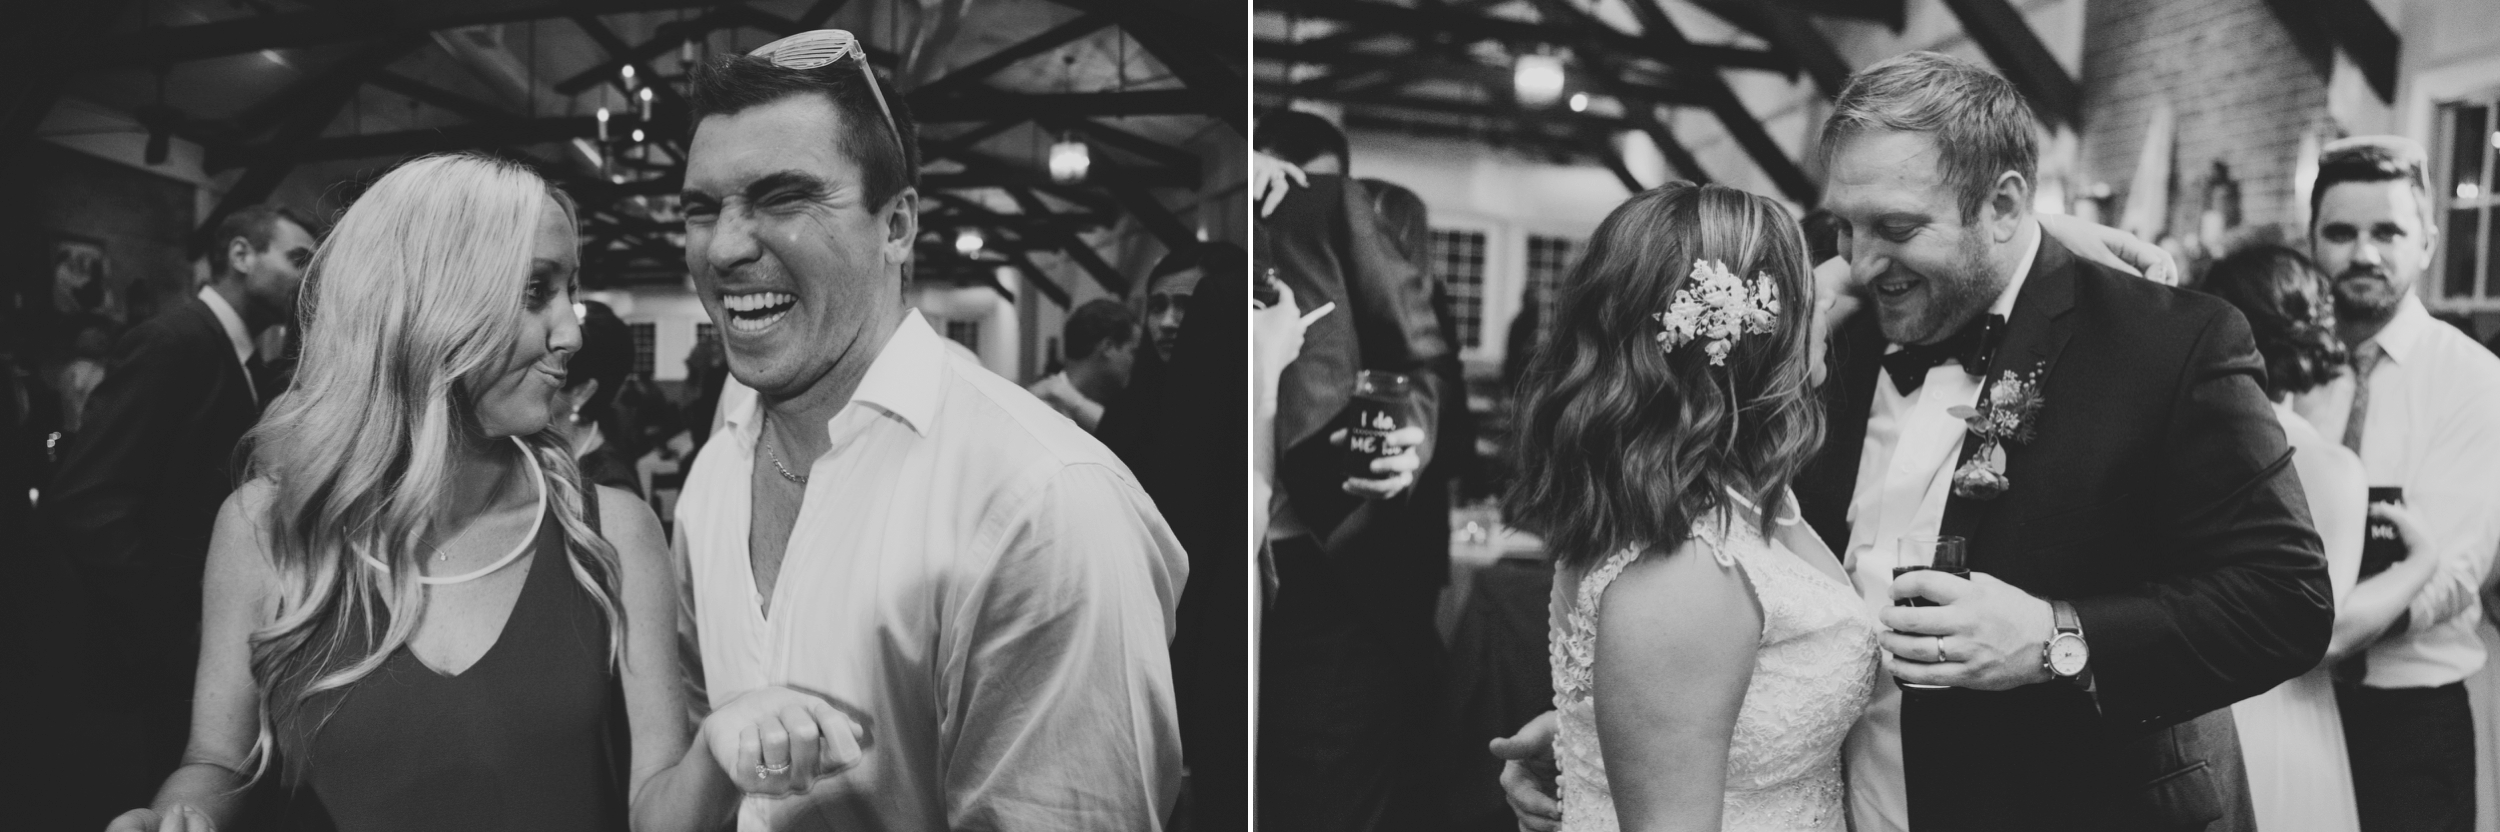 Charleston-wedding-photographer-129.jpg